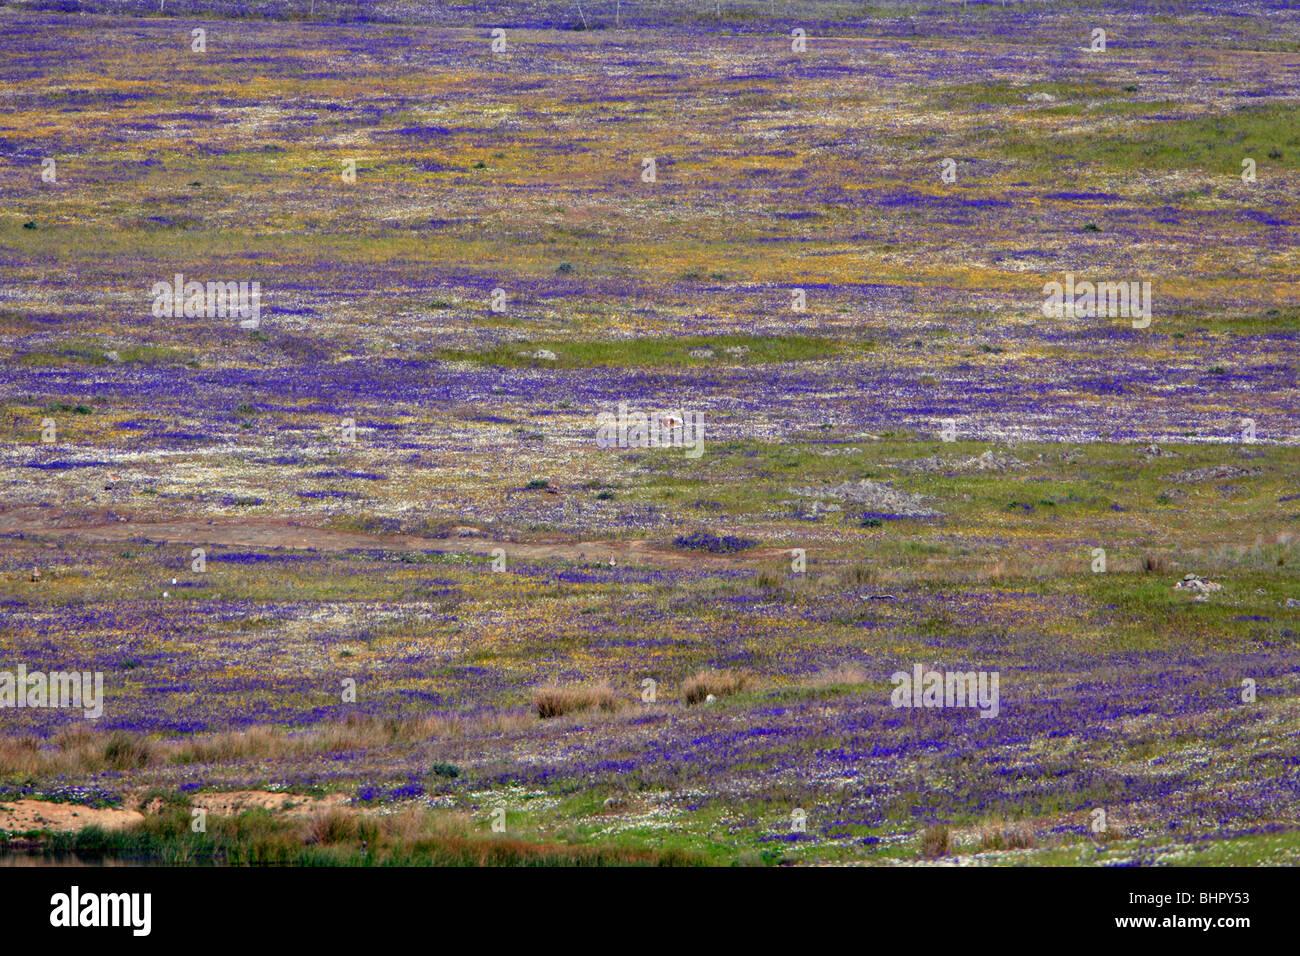 Great Bustard (Otis tarda), displaying area, lek, amongst wild flowers, Alentejo, Portugal - Stock Image